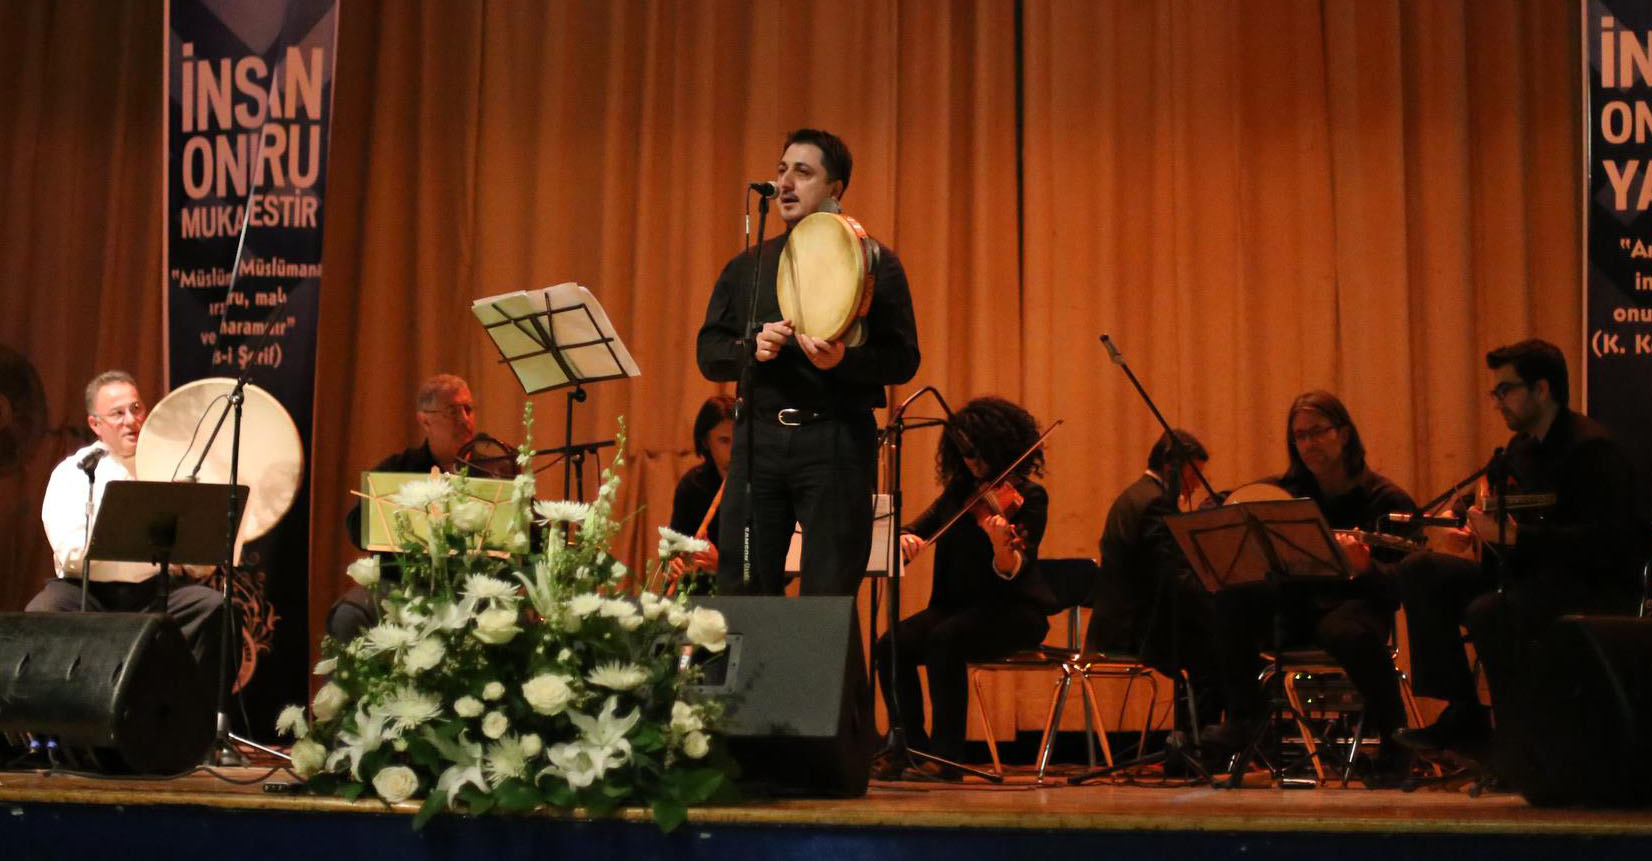 Kutlu Dogum Concert by Ahmet Erdogdular